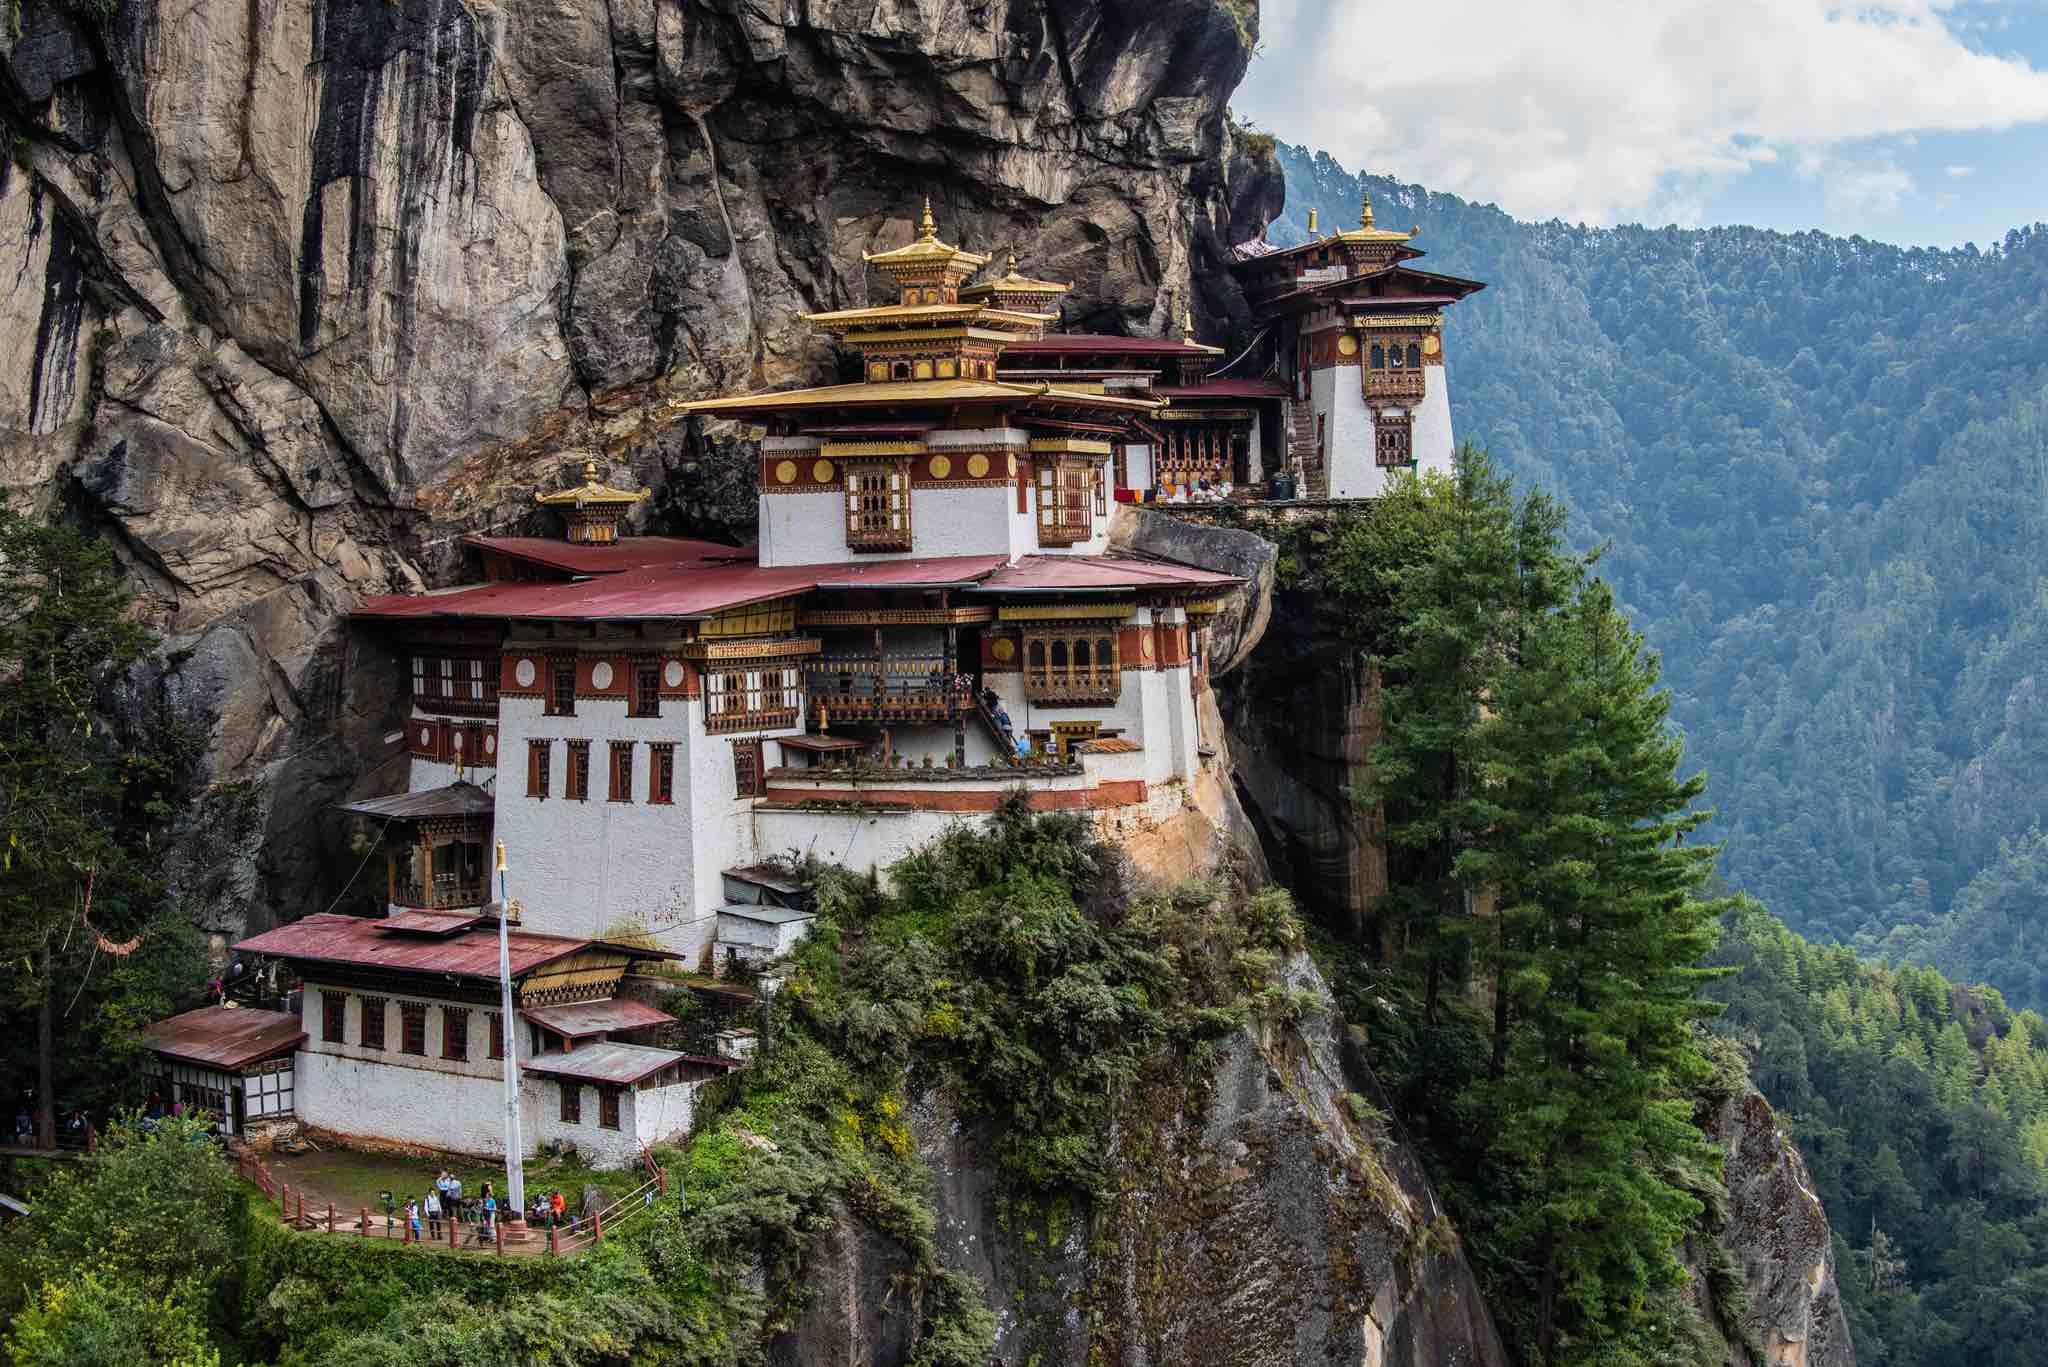 BHUTAN'S TIGER'S NEST